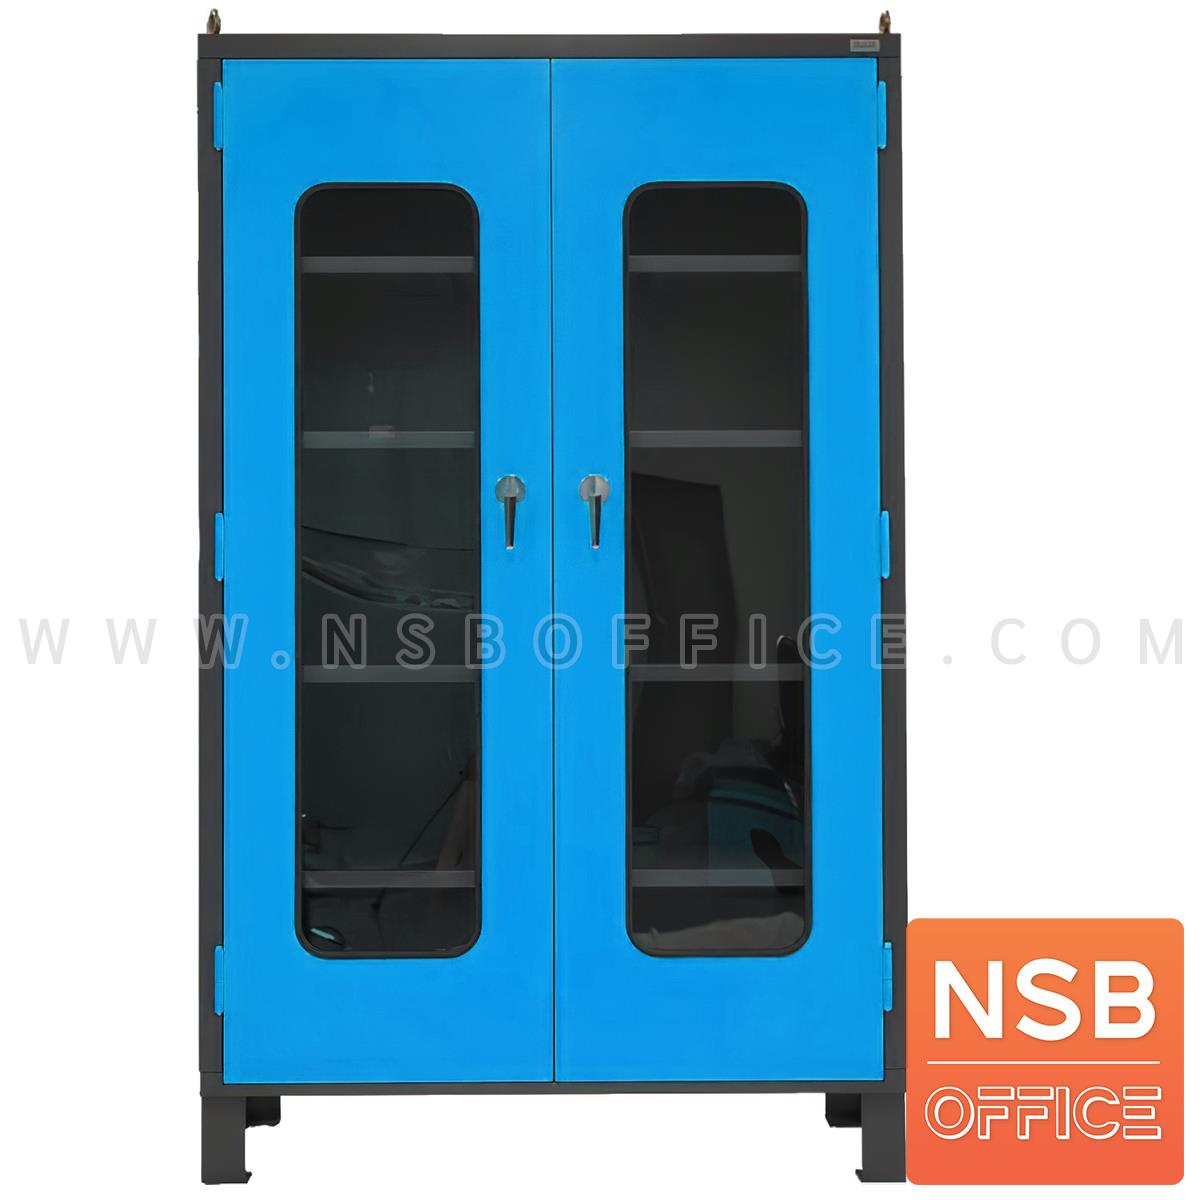 E09A033:ตู้เก็บอุปกรณ์ รุ่น Valhein (แวลไฮน์) ขนาด 120W*165.5H cm.